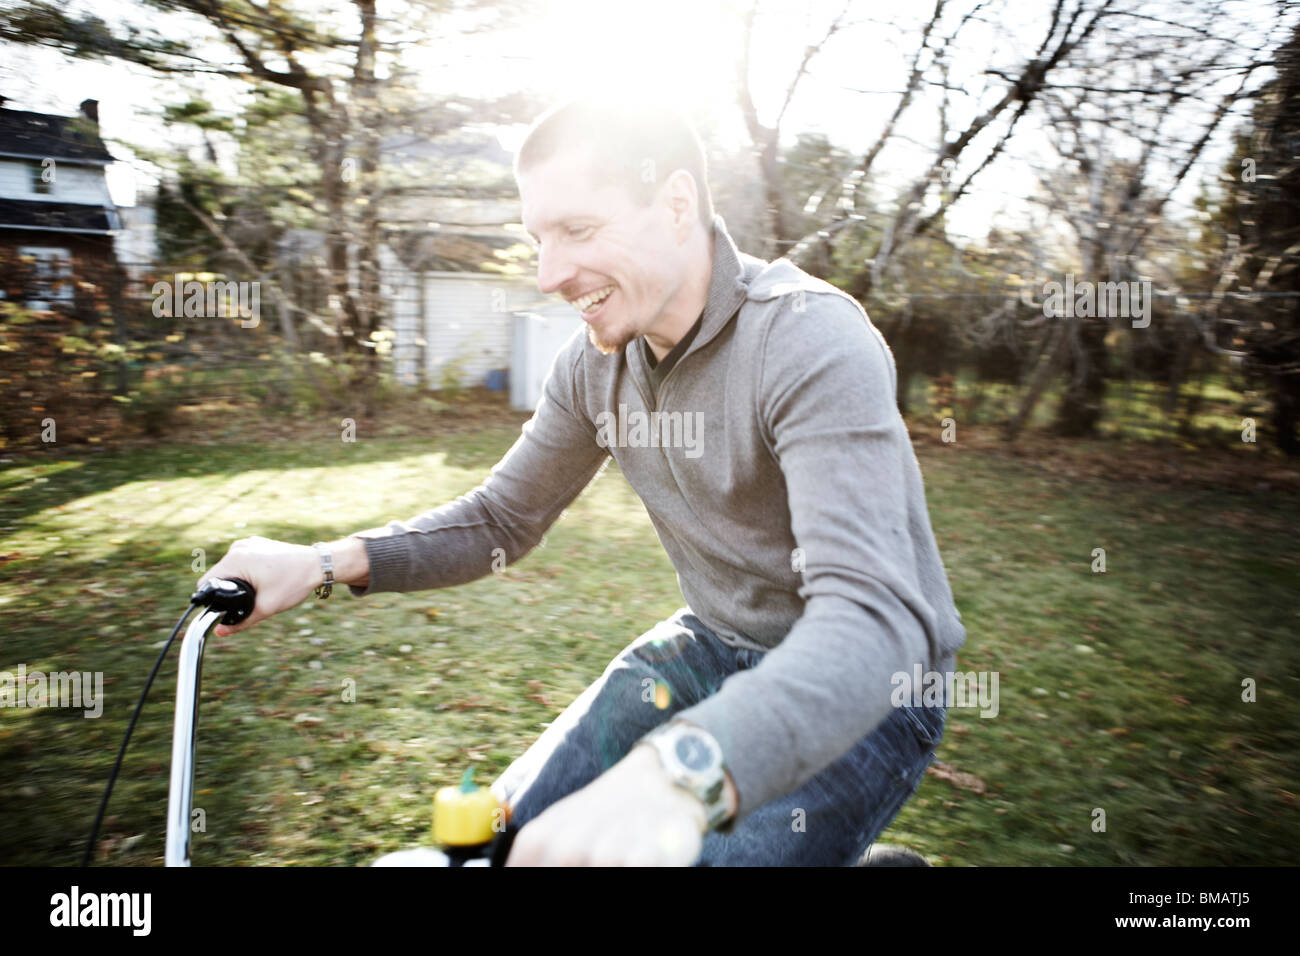 man on bicycle - Stock Image